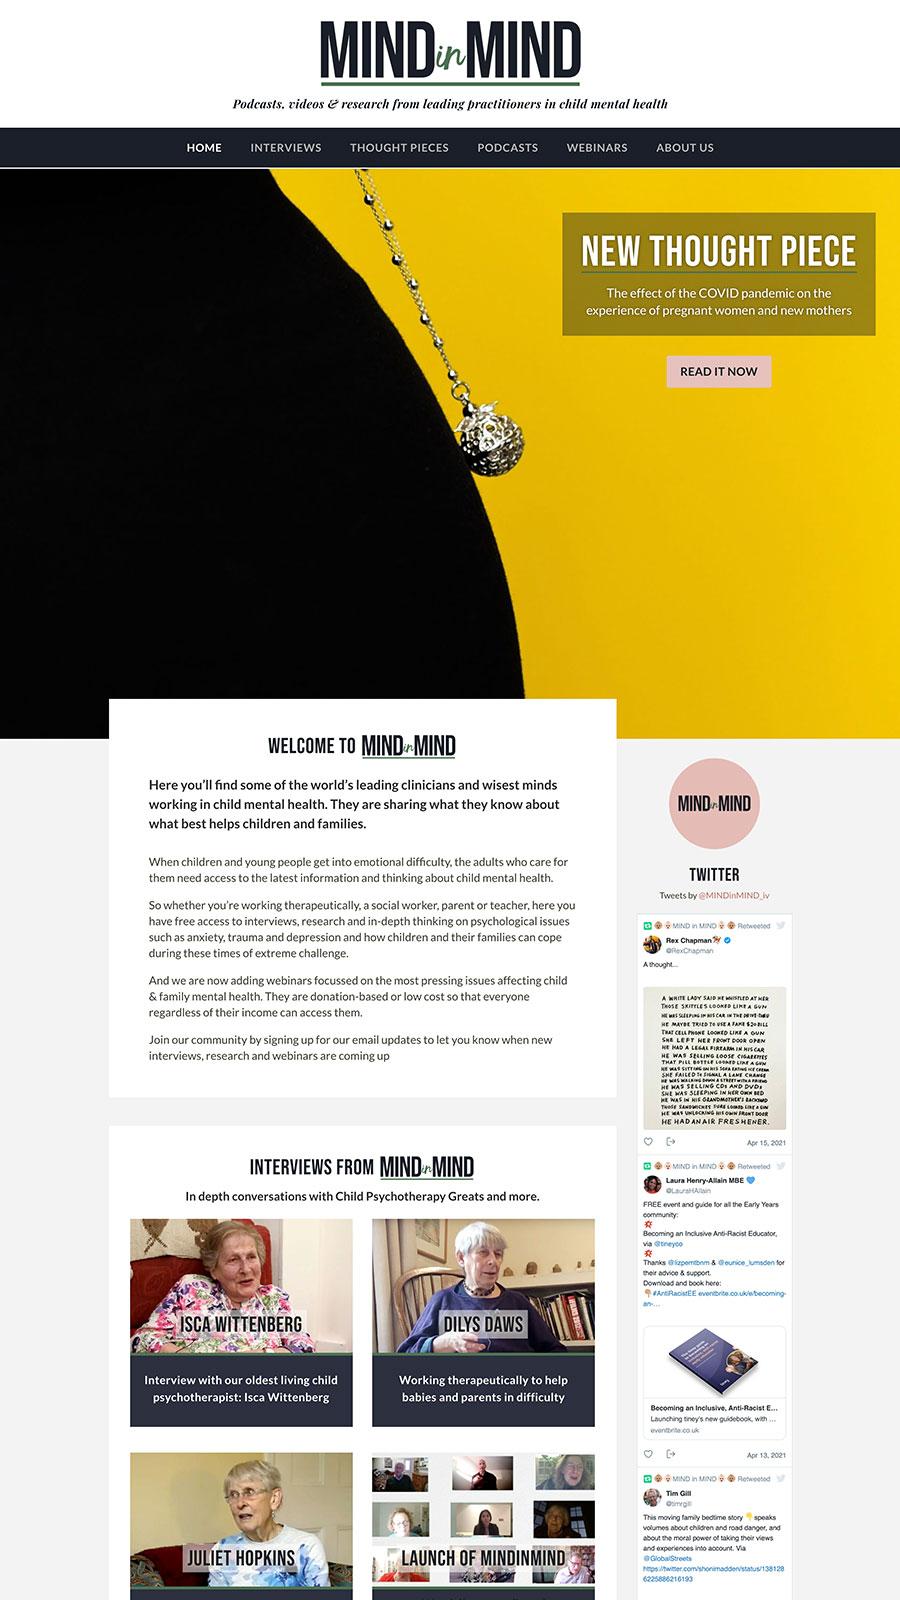 A screenshot of the MINDinMIND website